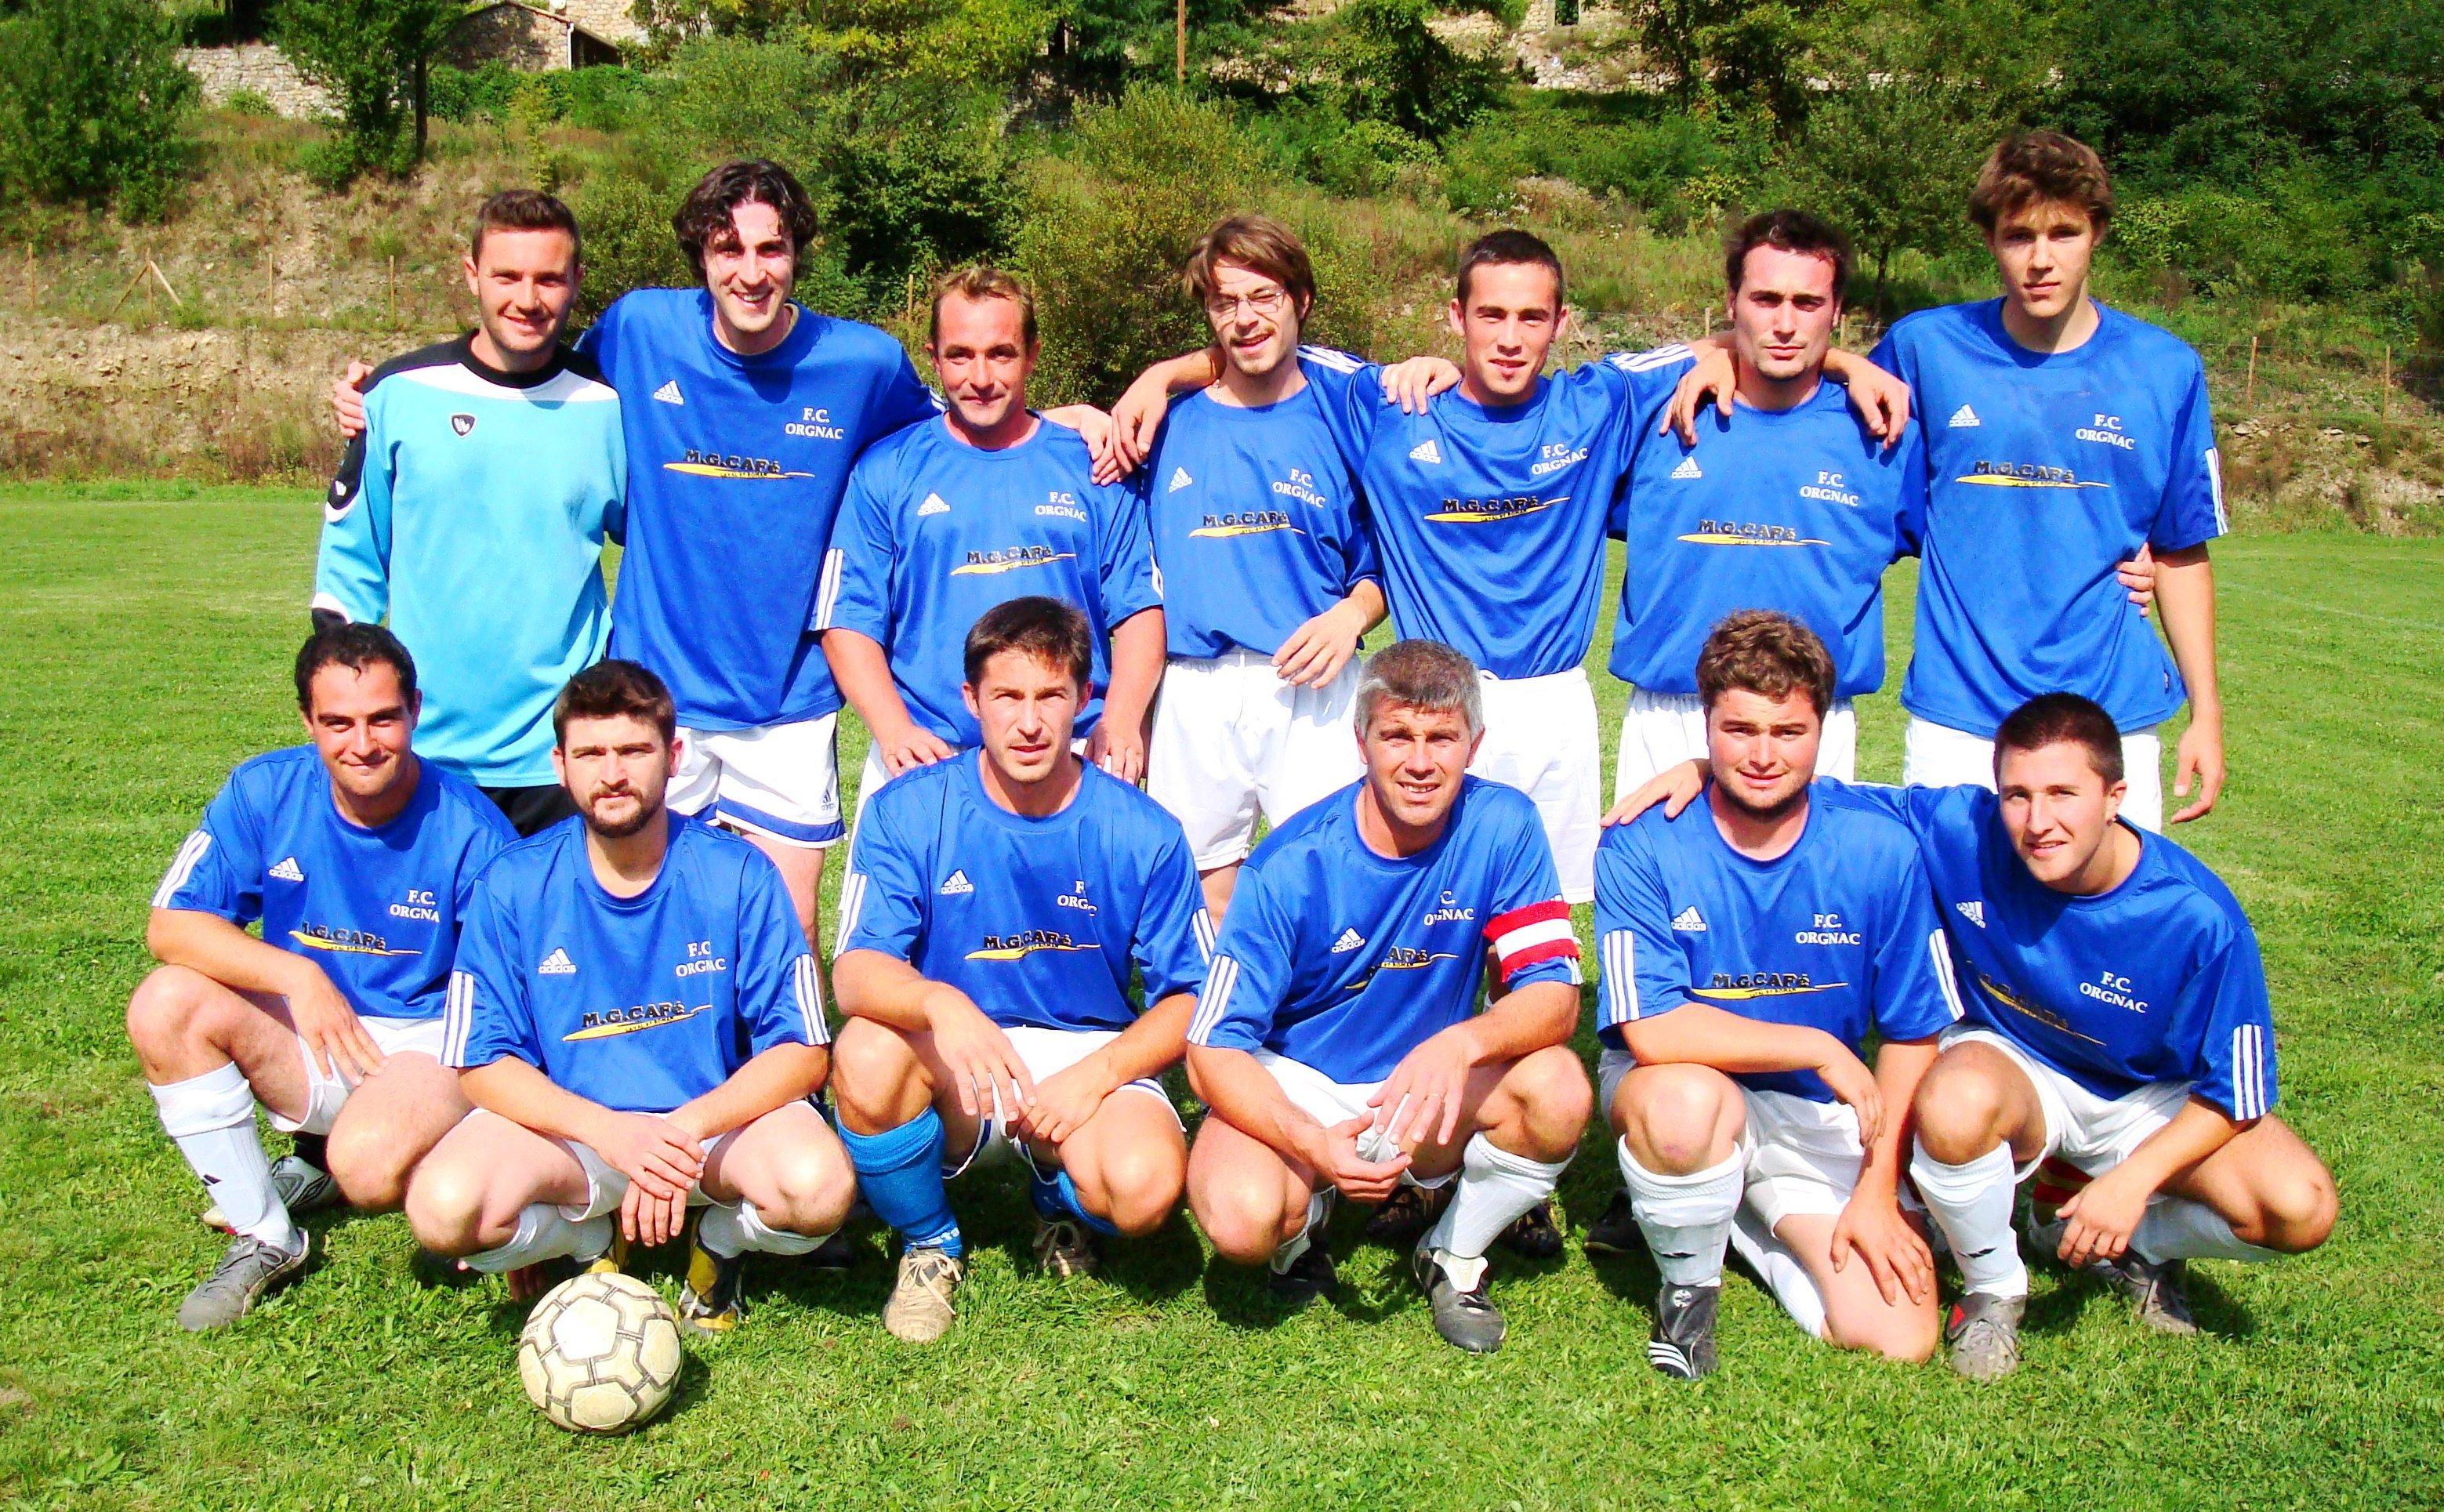 Equipe F.C.O